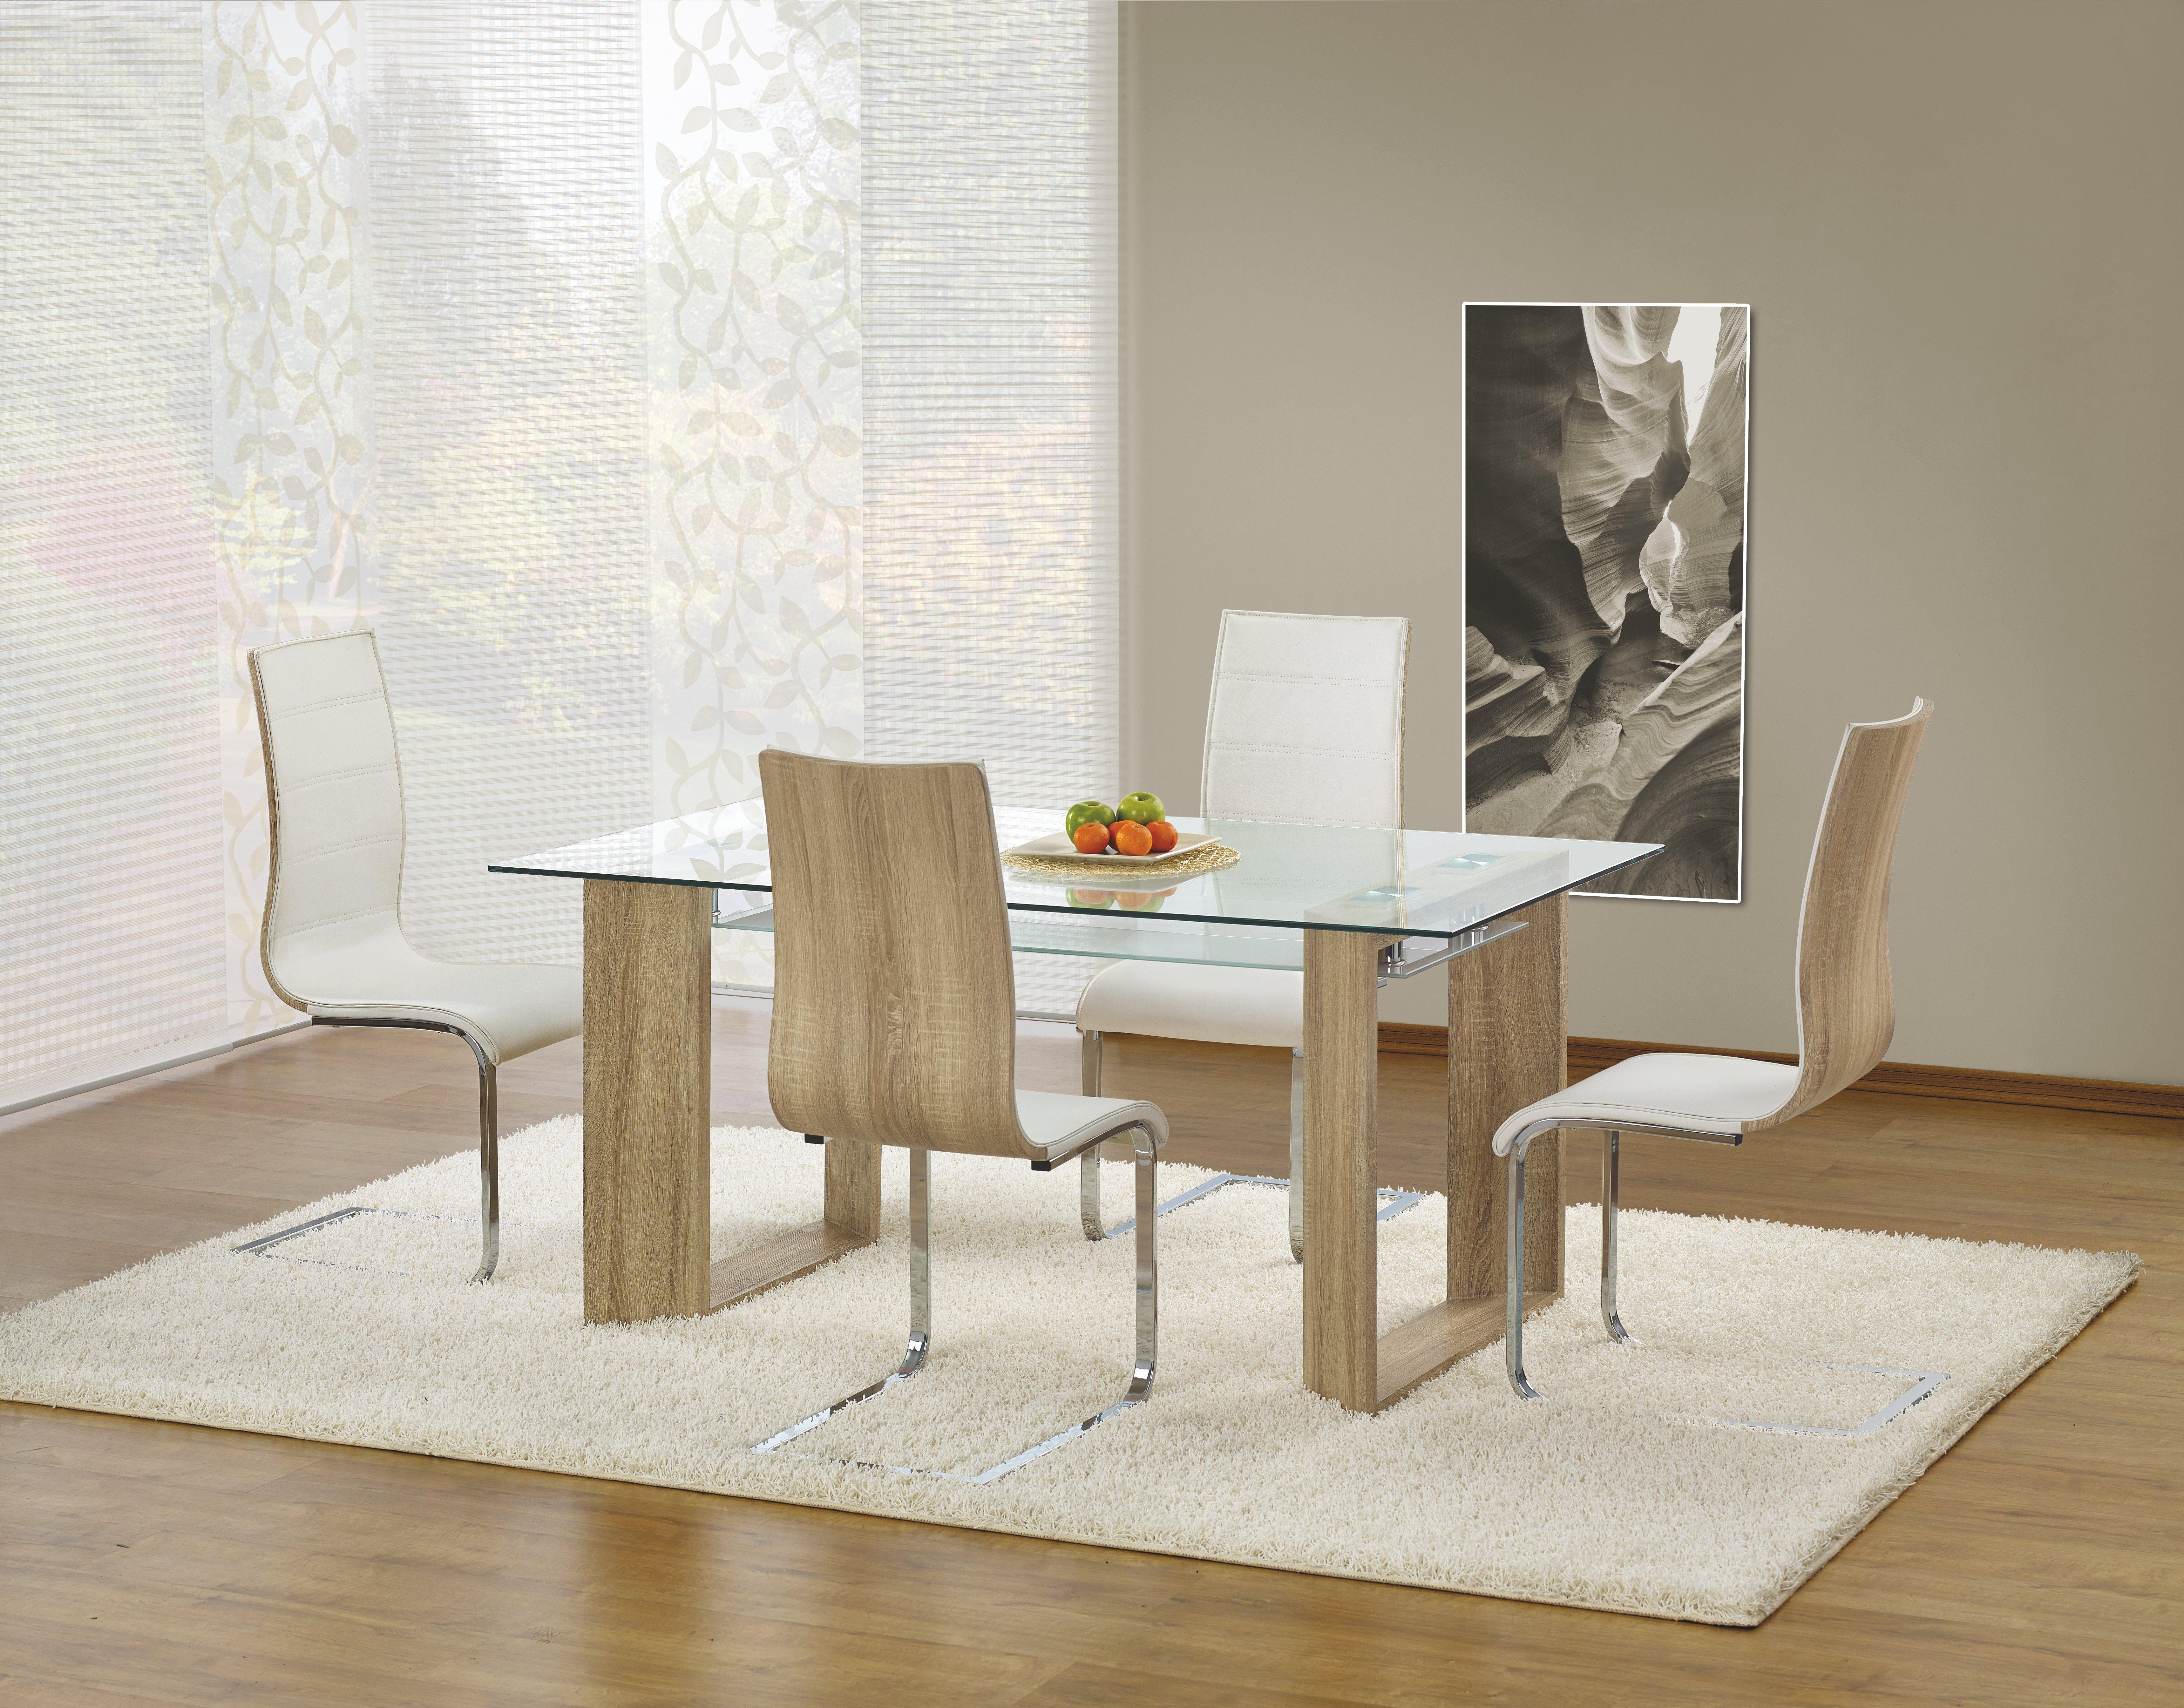 Jídelní stůl - Halmar - HERBERT (pro 6 osob)